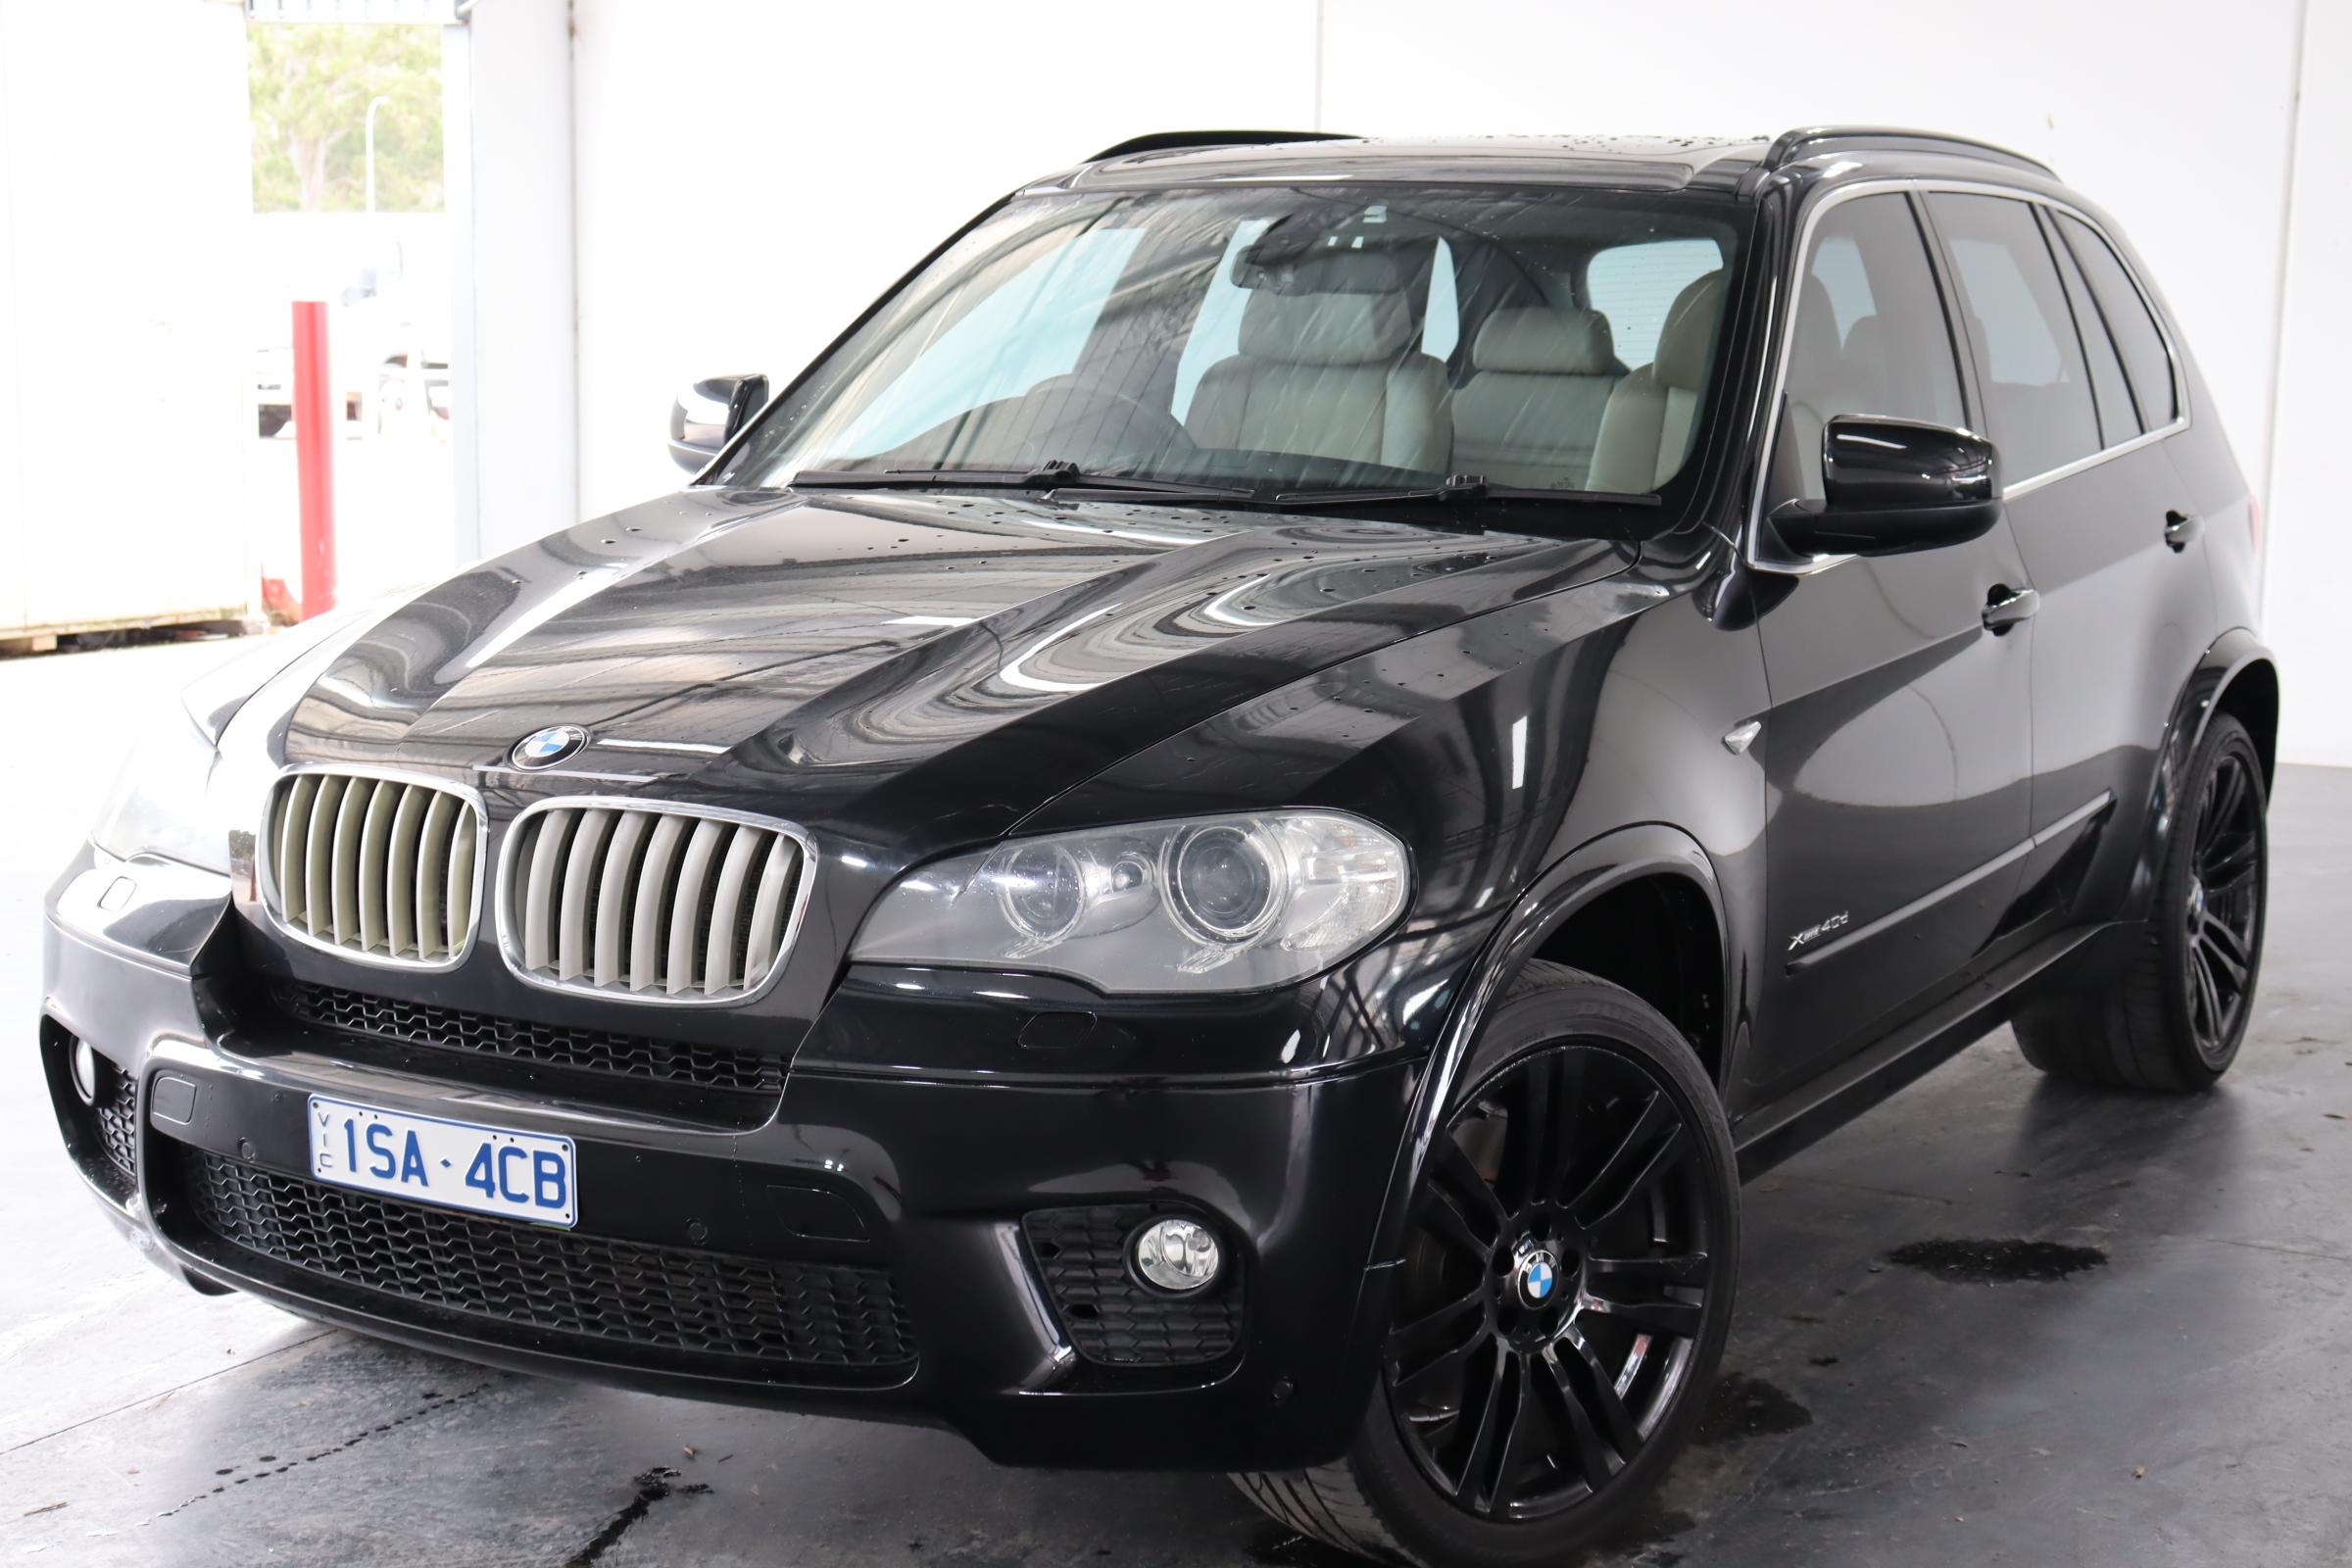 2010 BMW X5 40d Xdrive Motorsport wagon 178klms